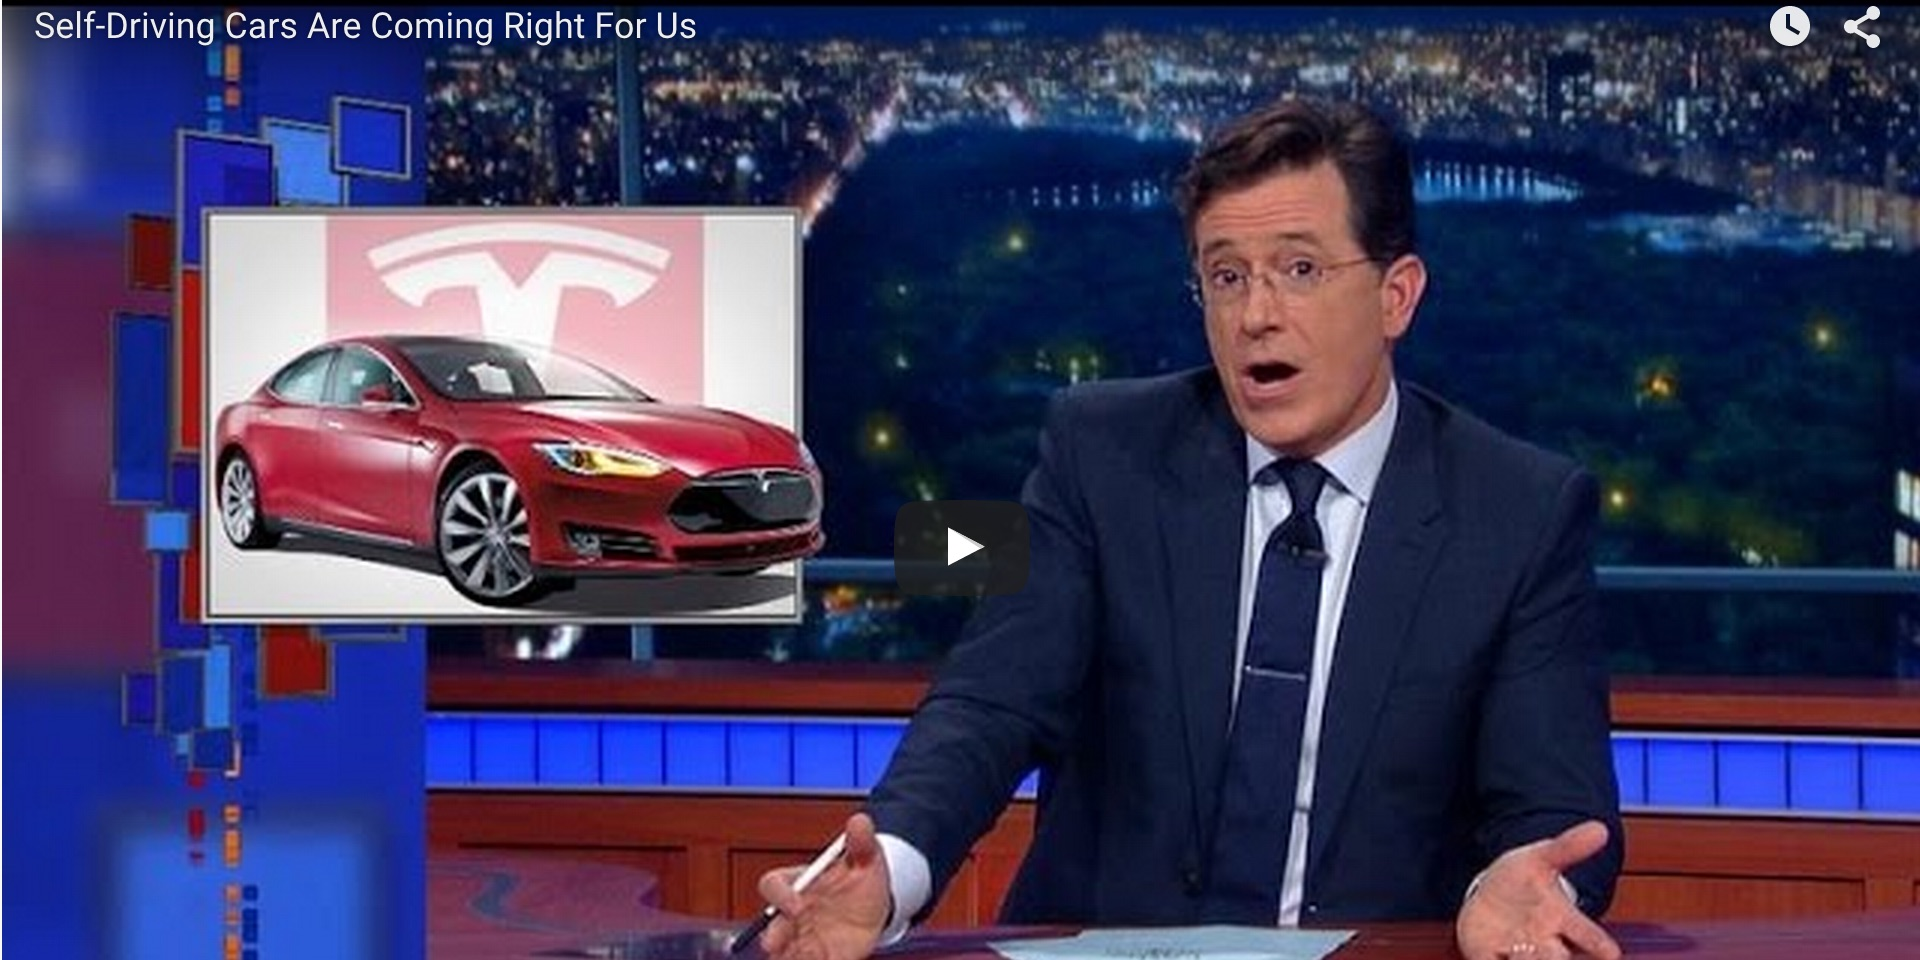 Stephen-Colbert-Tesla-autopilot